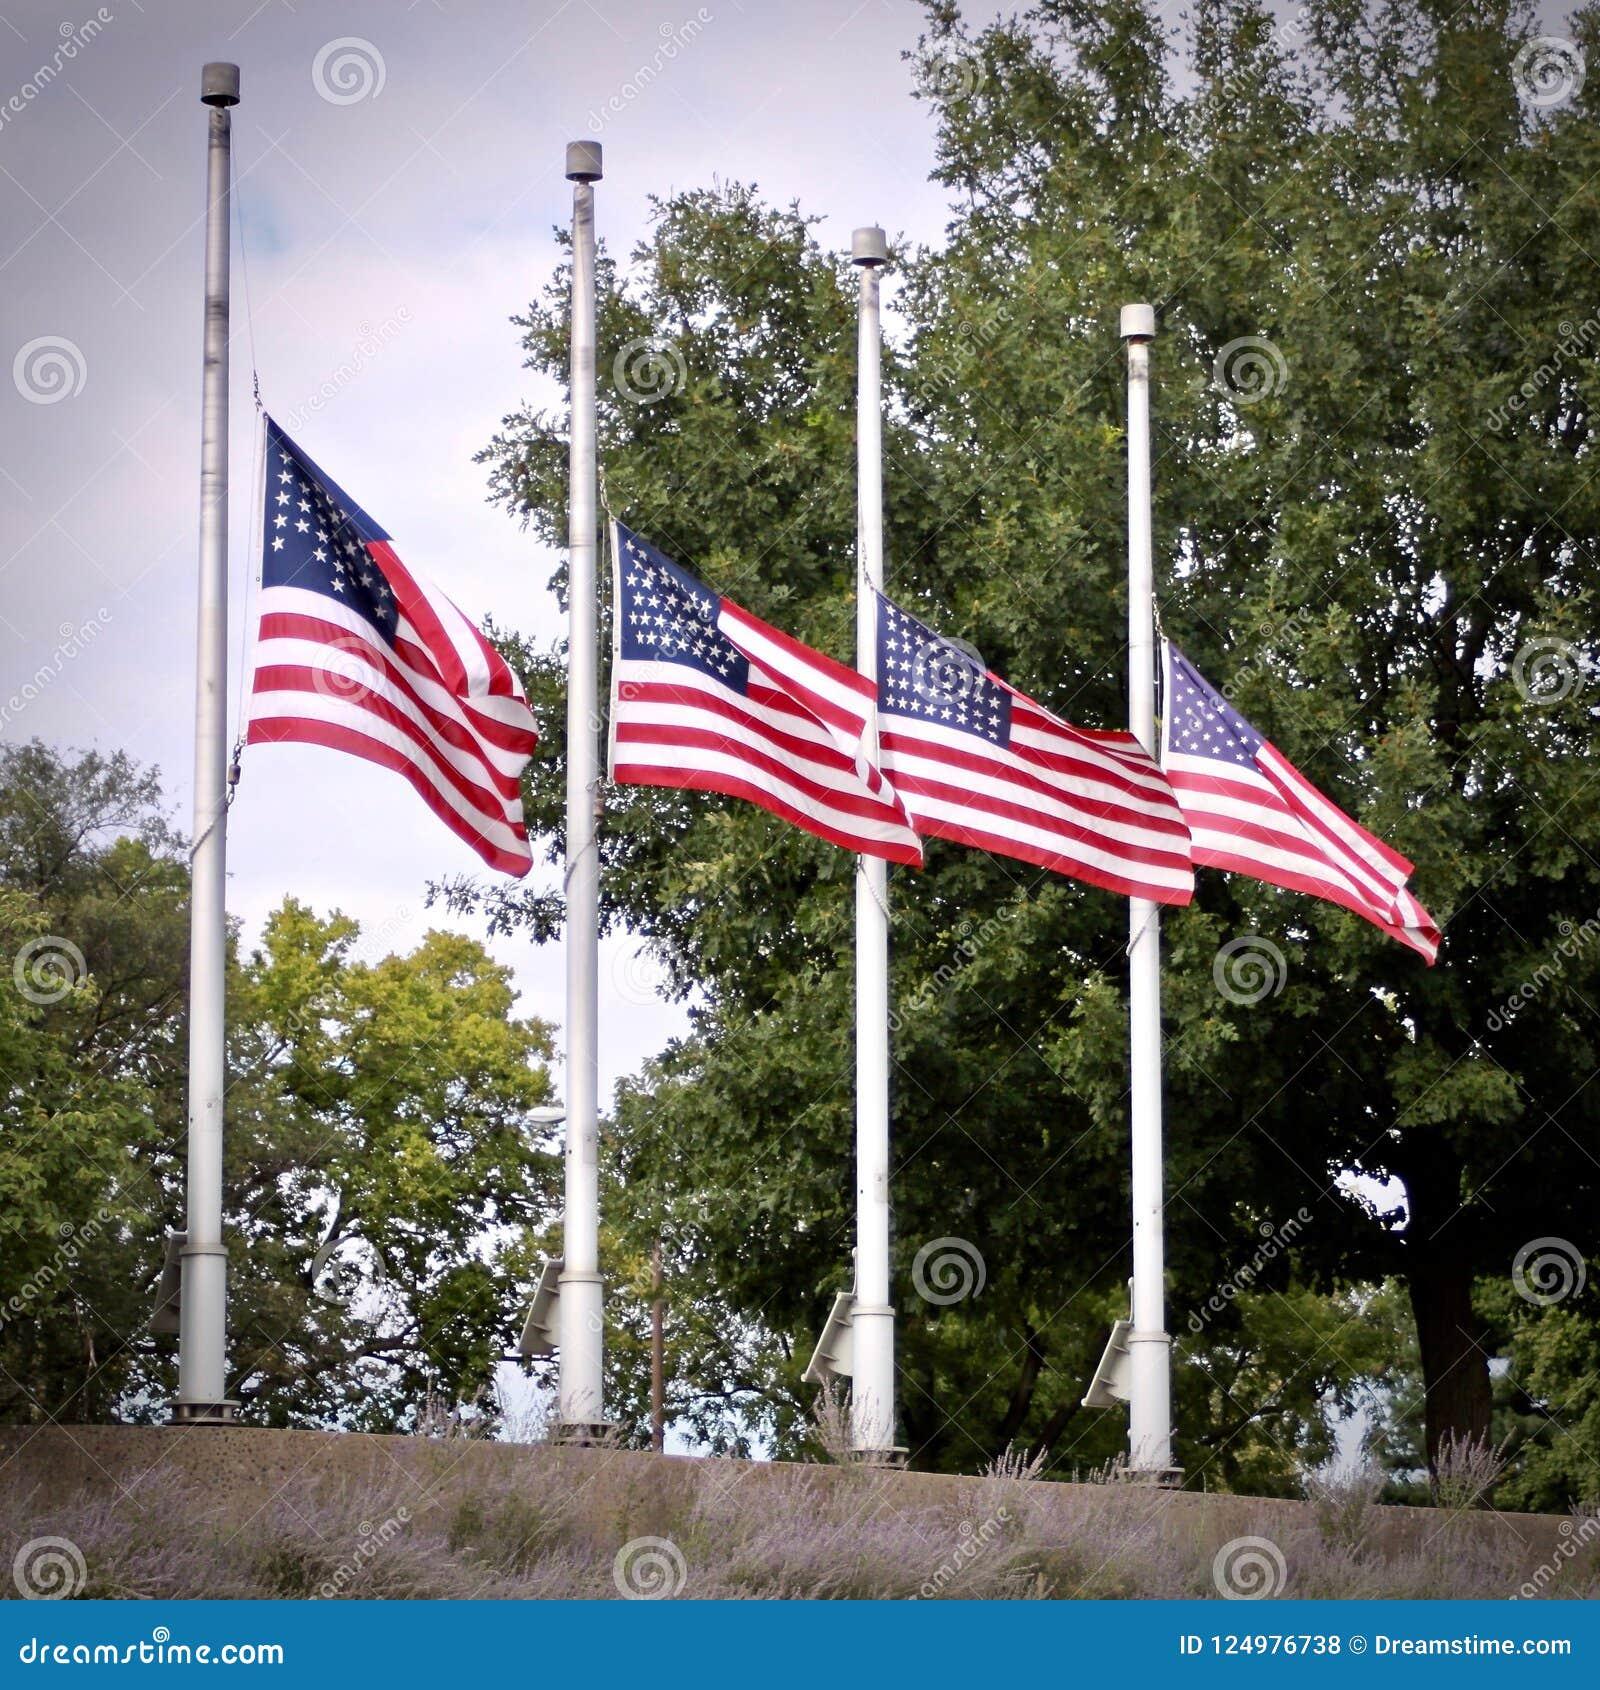 4 amerikanische Flaggen am Halbmast